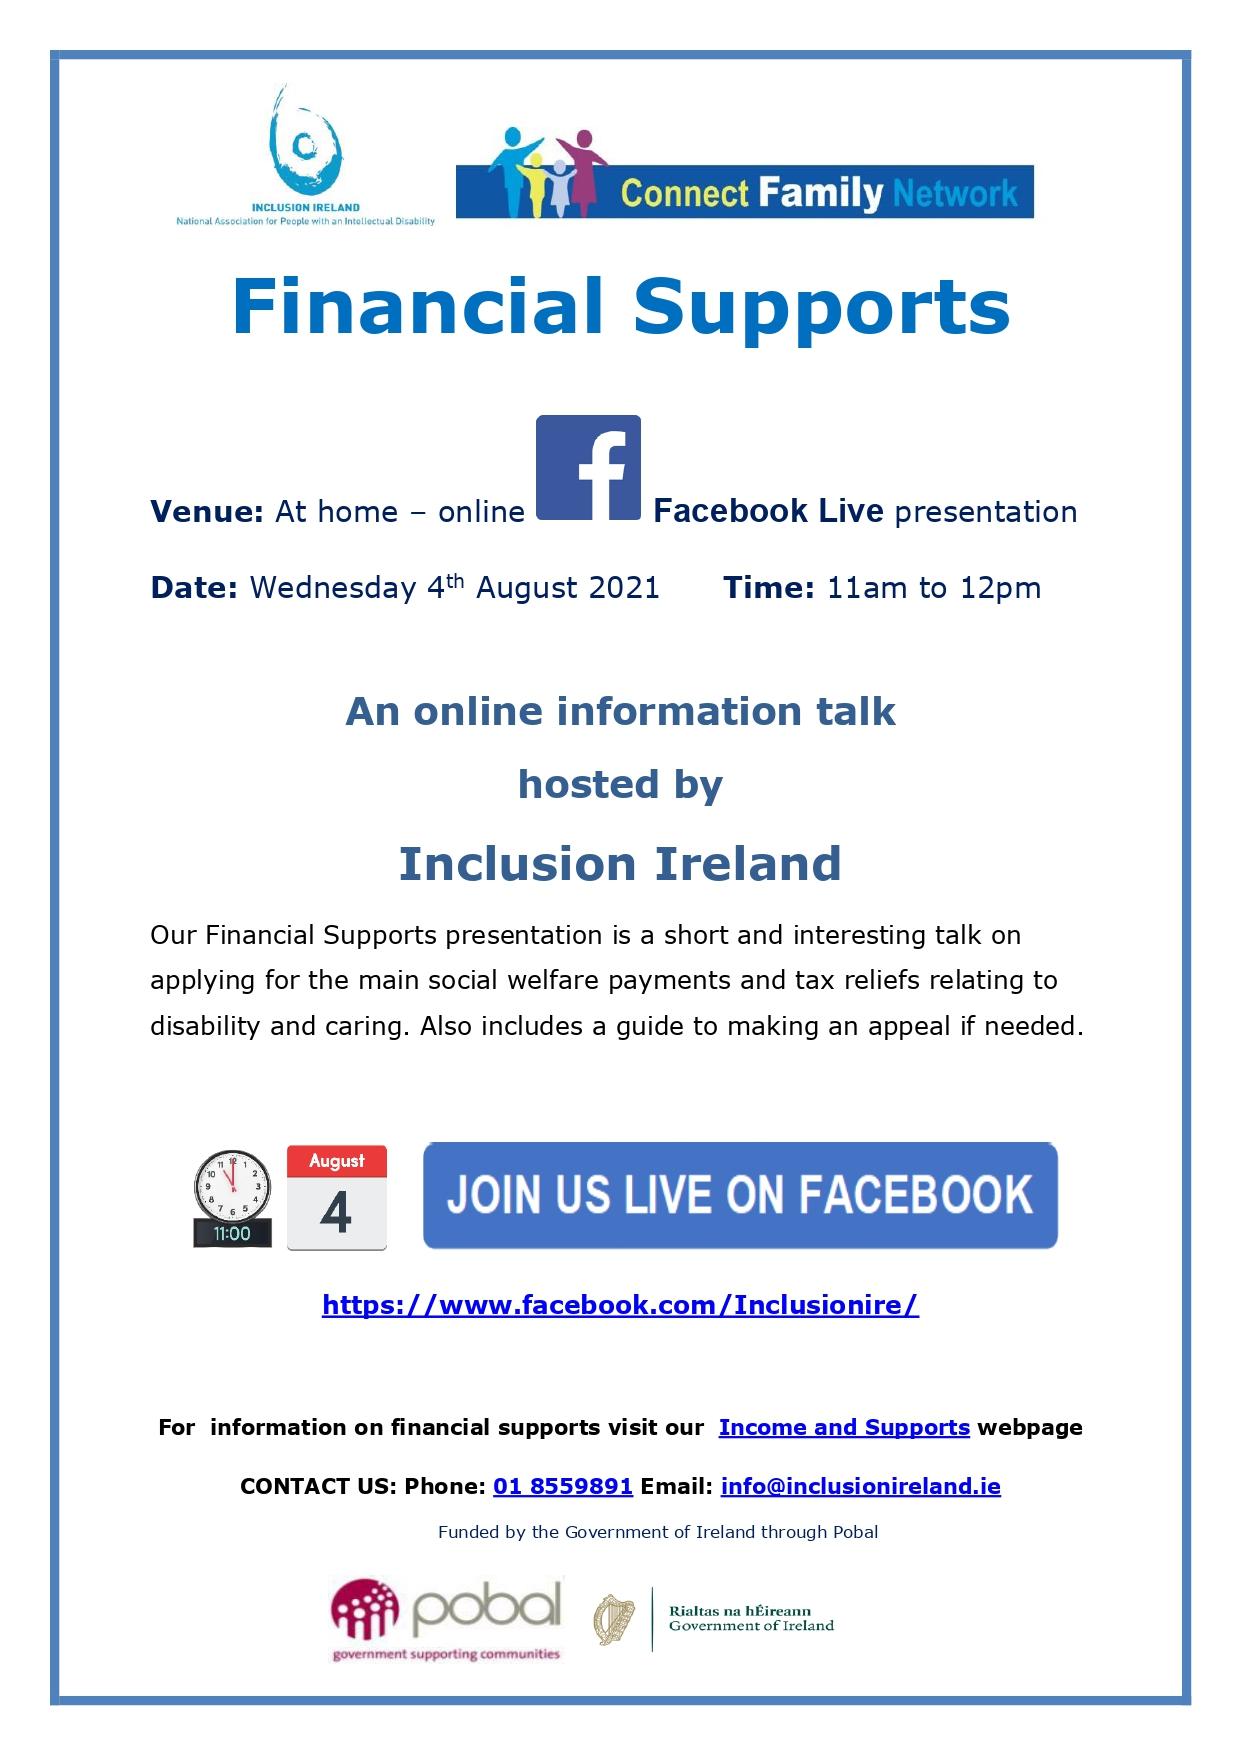 Financial Supports – Online Information Talk